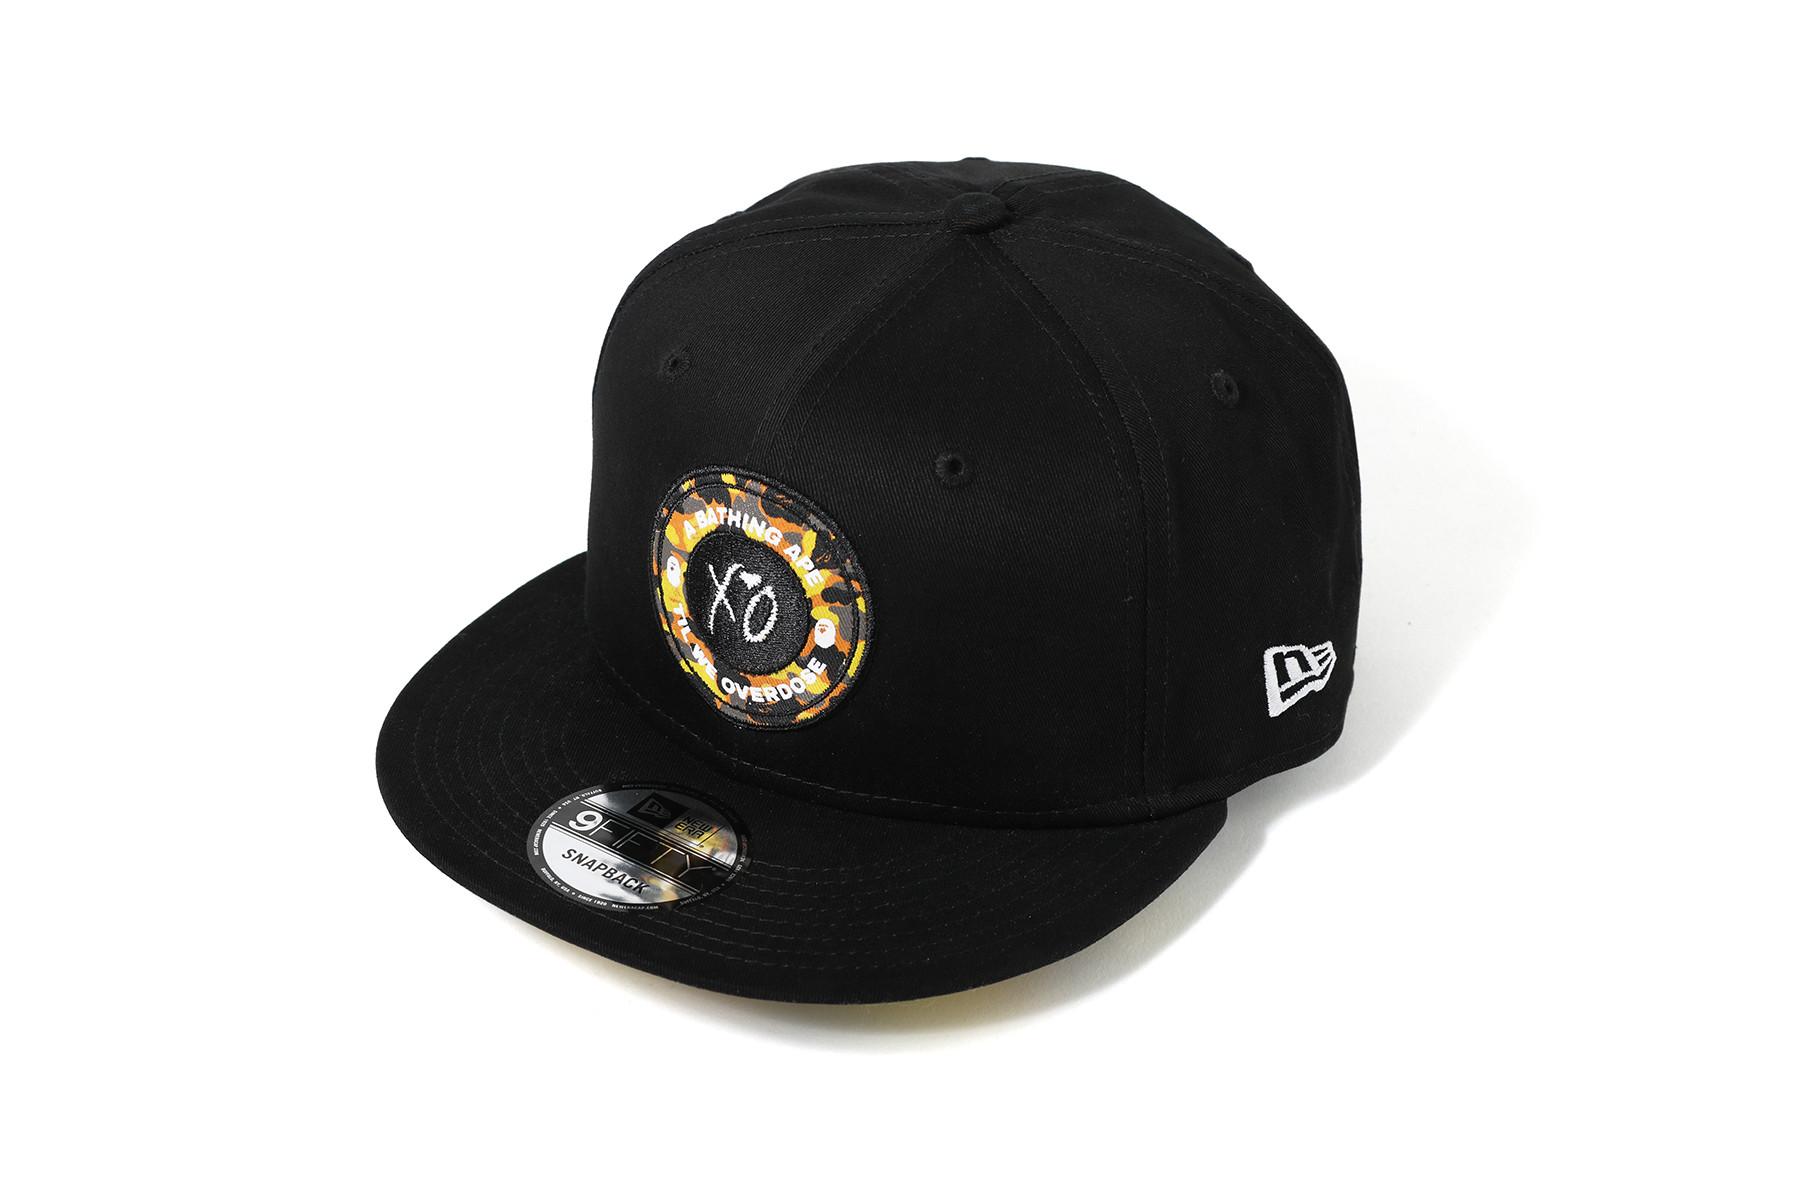 new arrival 60c1c b2bac ... get bape x xo new era snapback cap black c3b85 4f06e